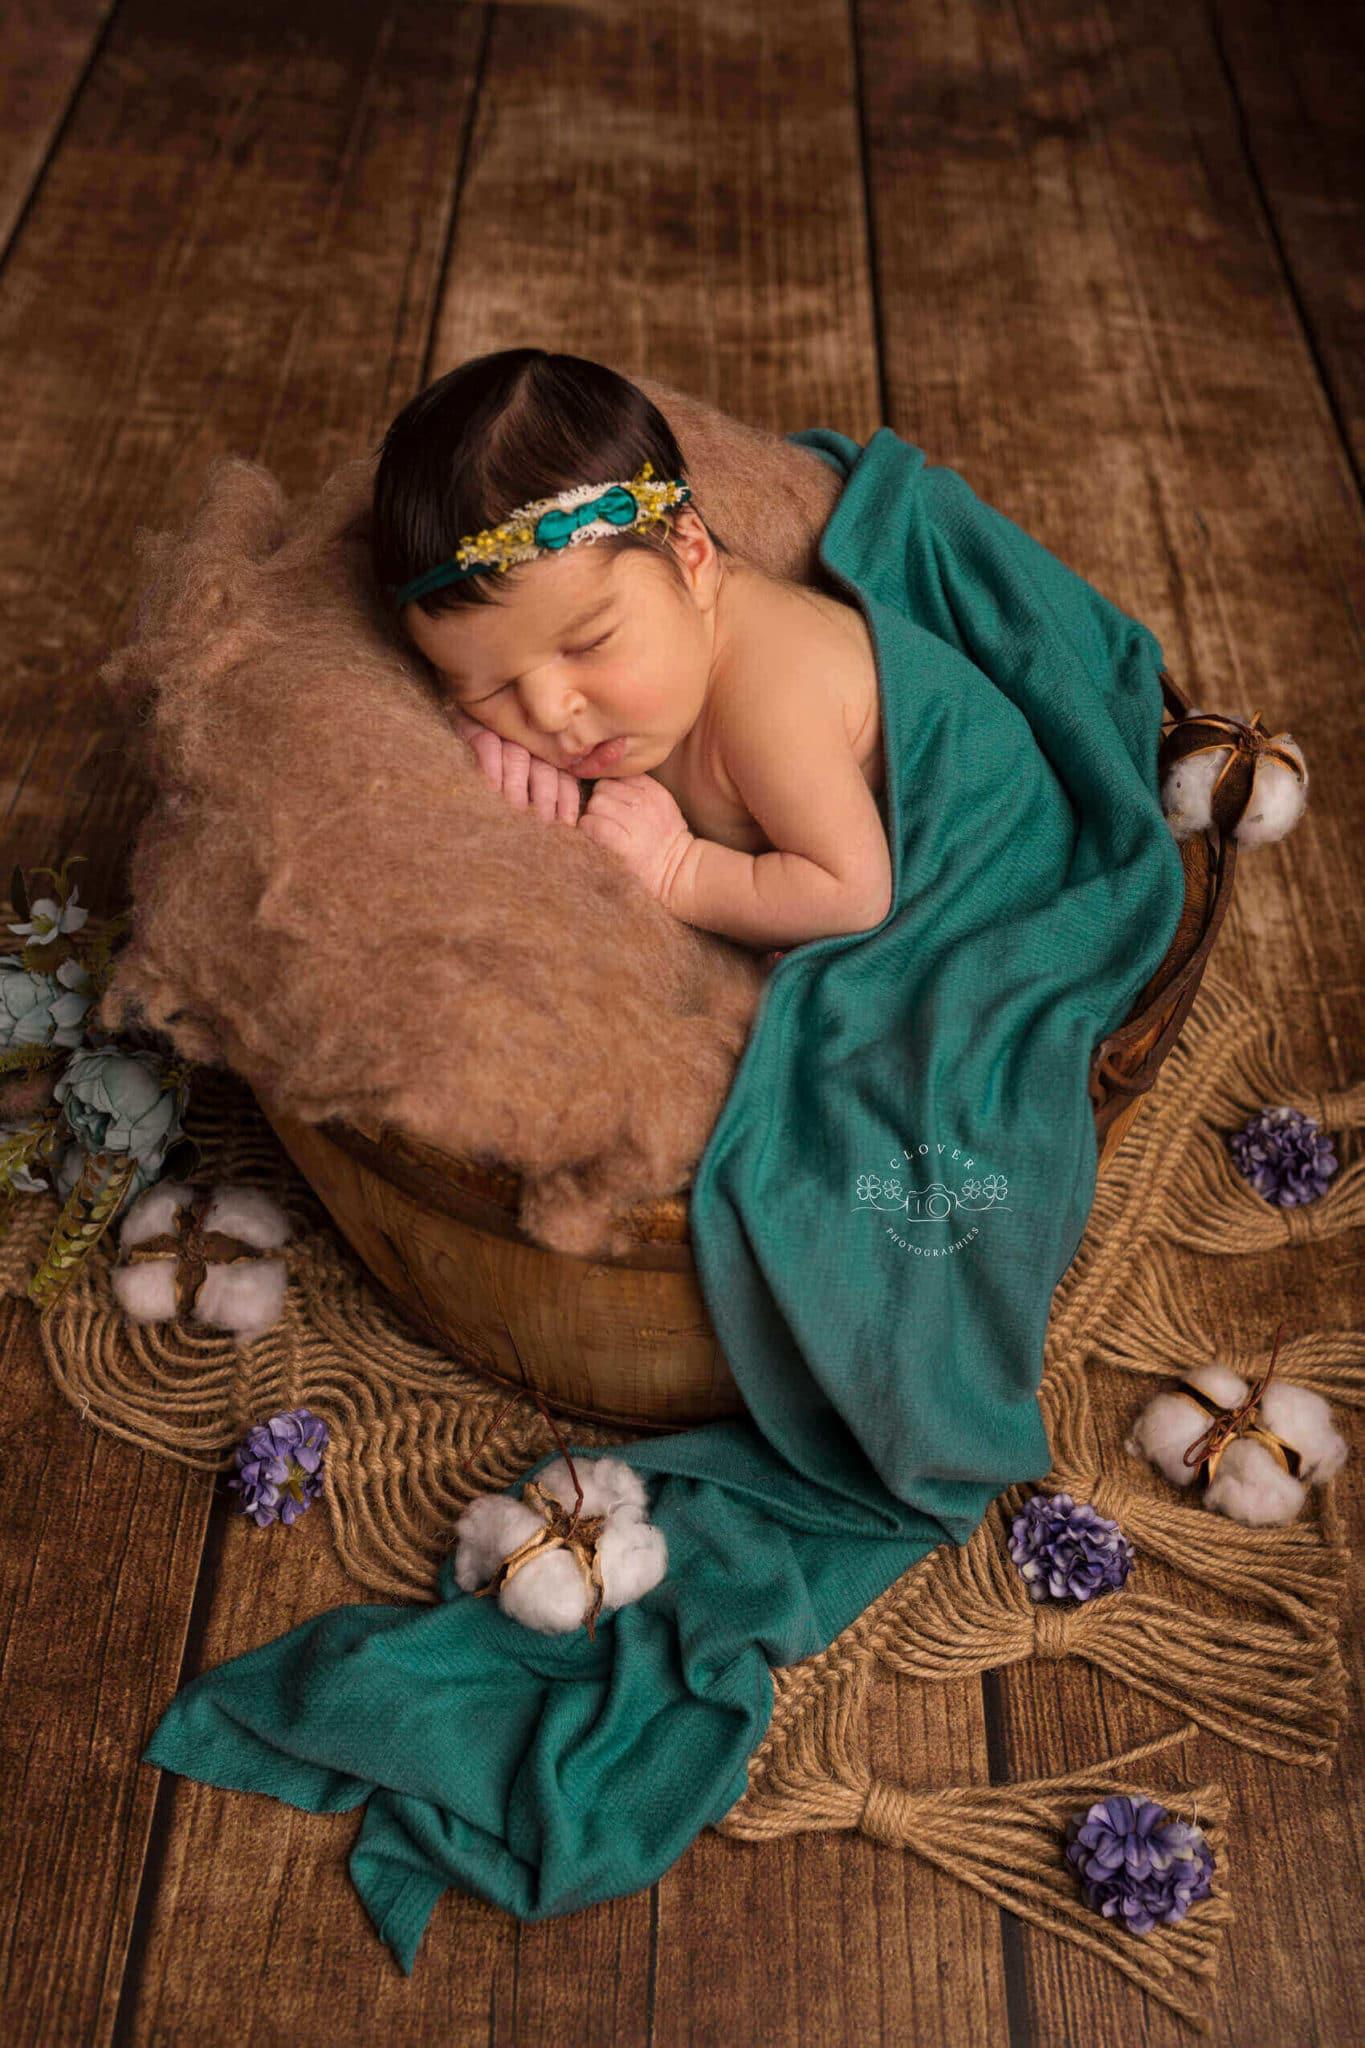 Séance photo naissance fille strasbourg - Clover Photographies